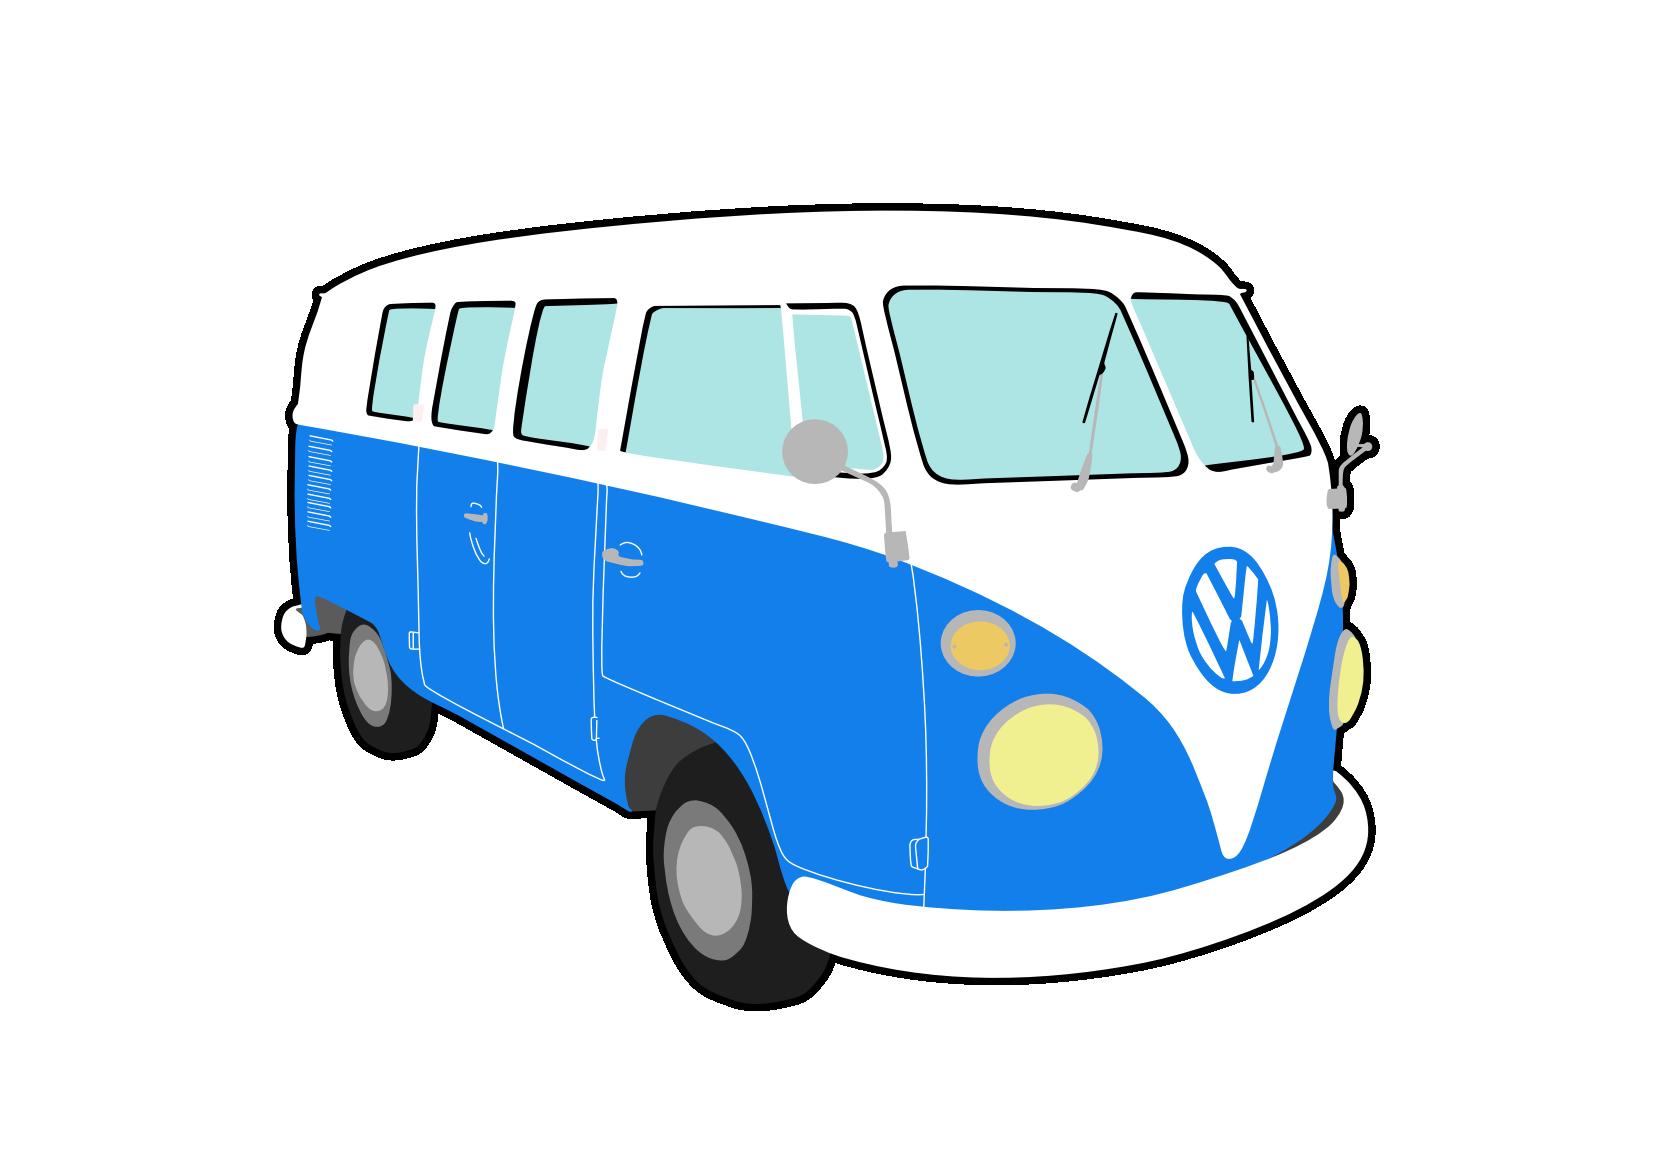 Blue Car clipart blue van Clker public clker vector vector